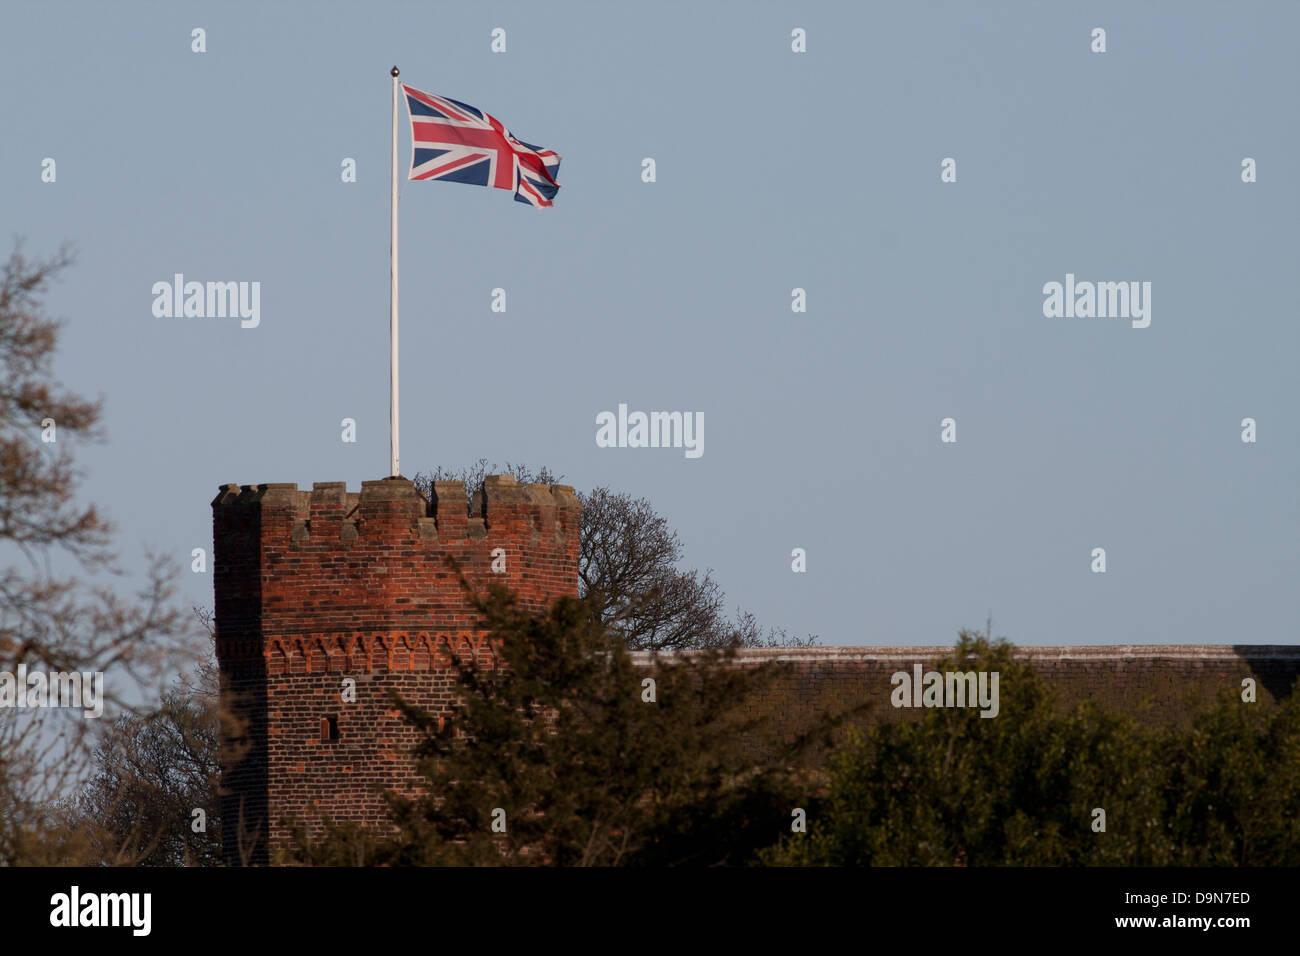 Union Jack on flagpole on top of tower - Stock Image